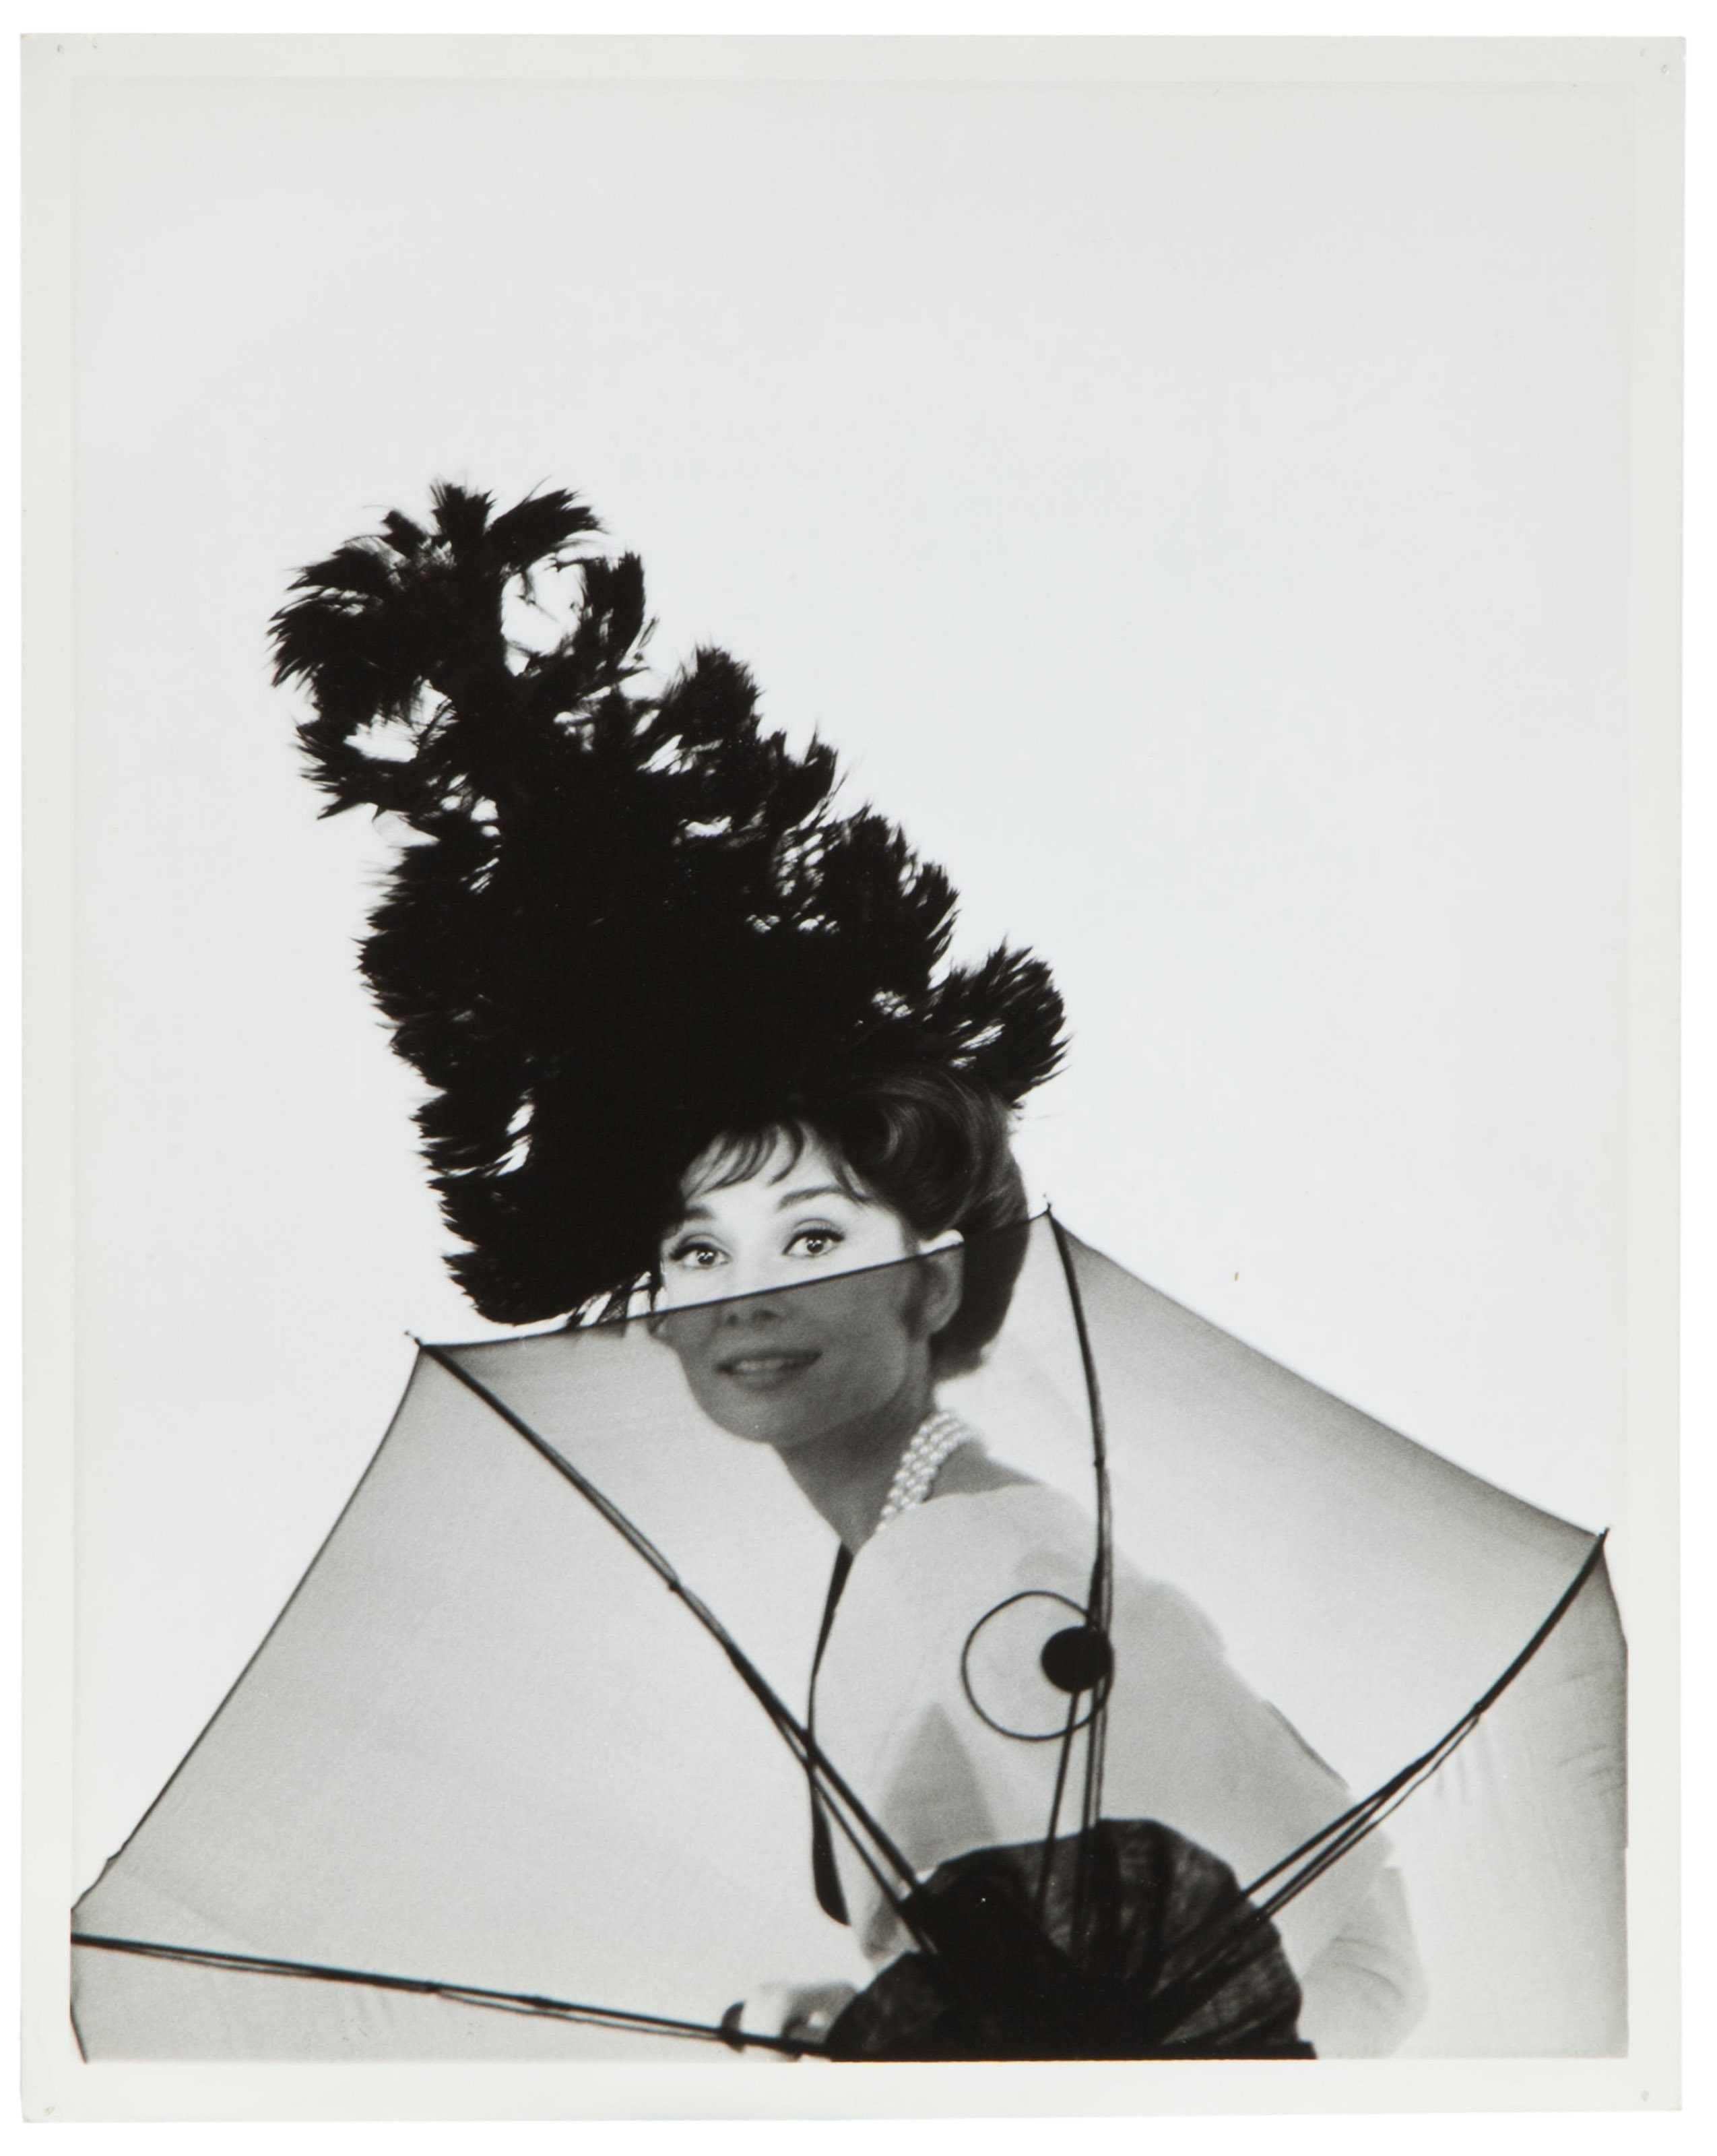 Cecil Beaton: Audrey Hepburn, c. 1964.